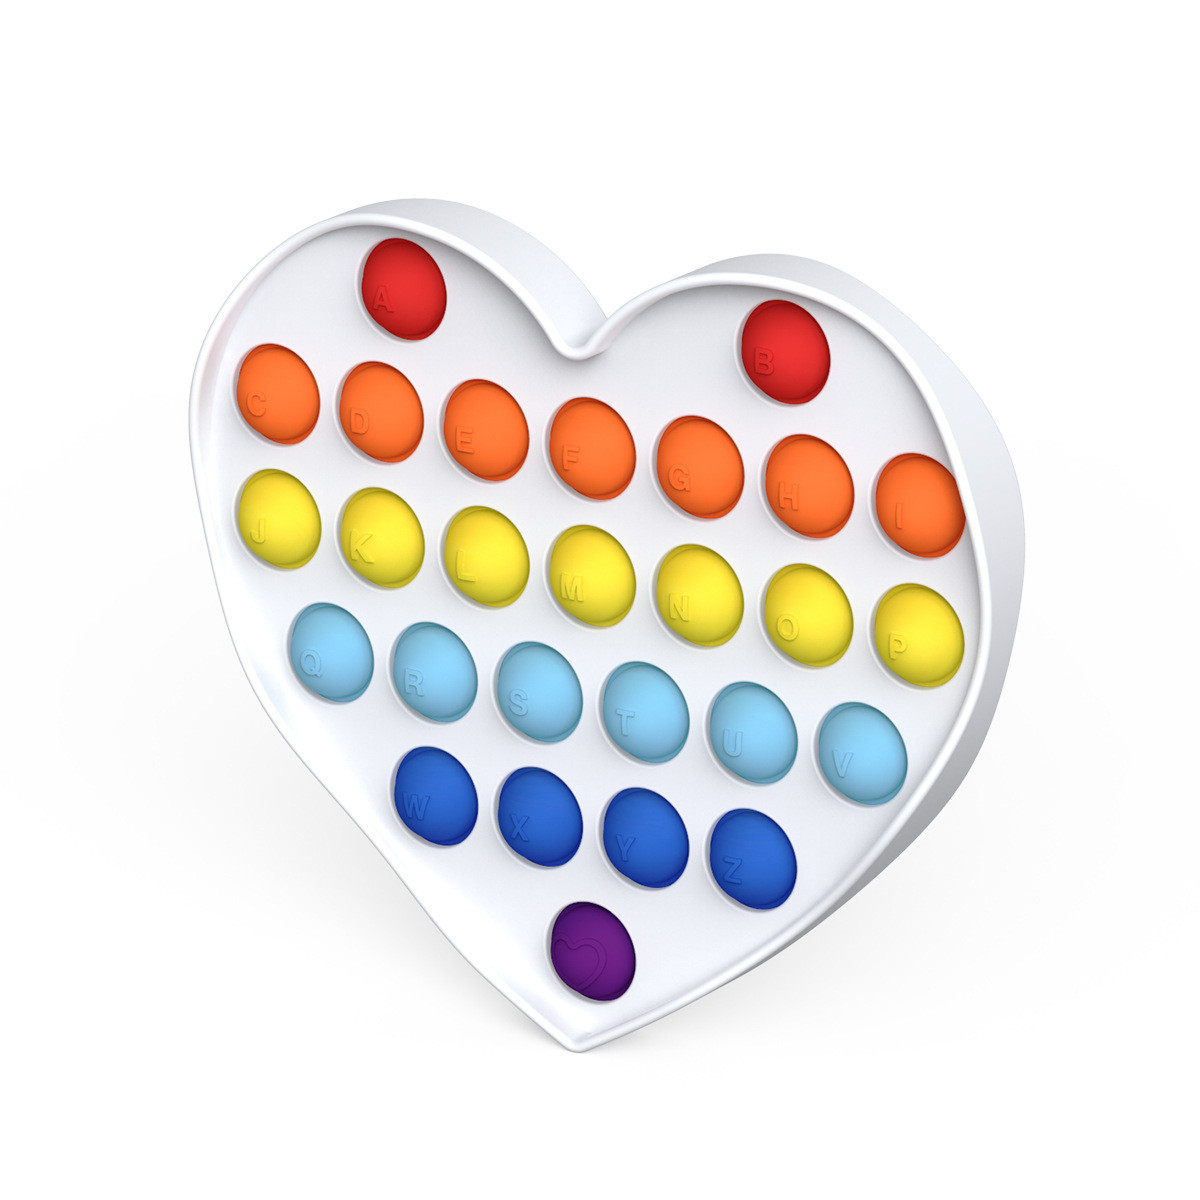 Игрушка антистресс Pop it на пластиковой основе сердце - фото 2